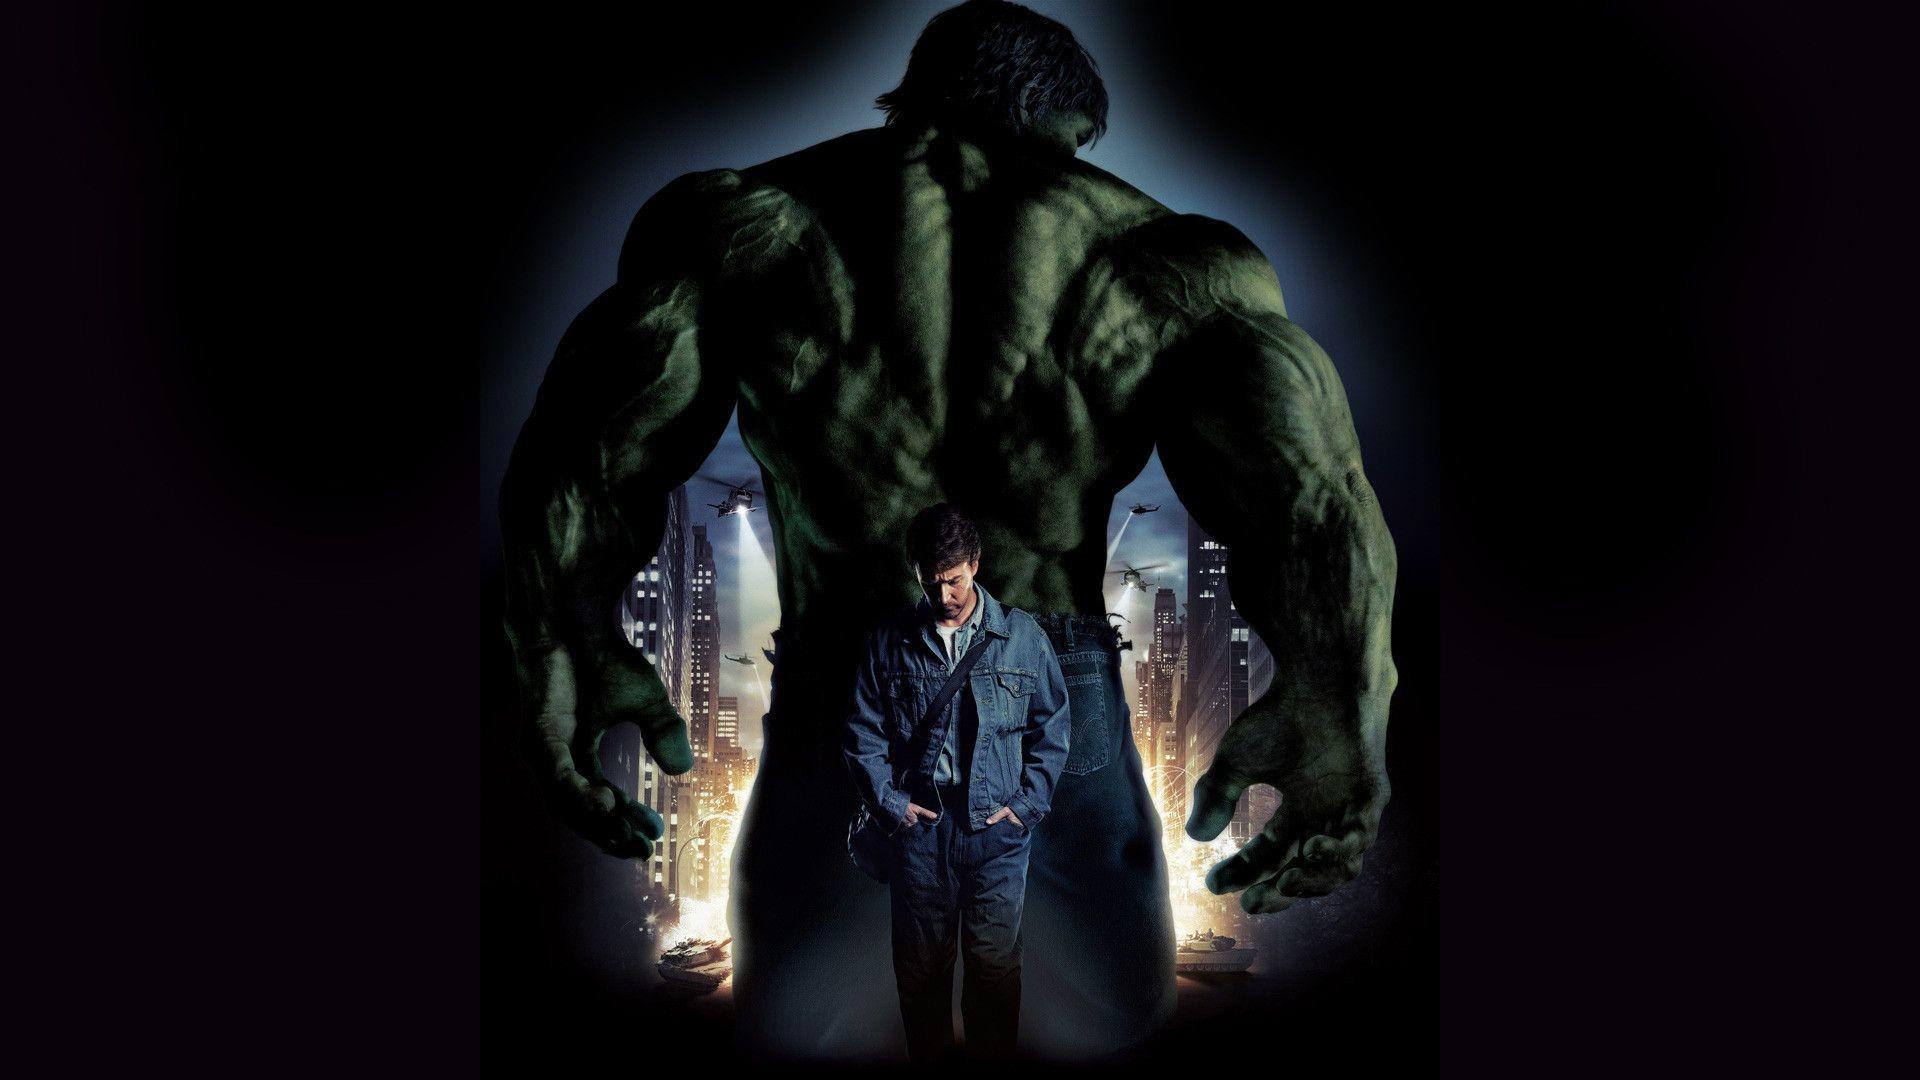 0 Hulkbuster Ironman Vs Hulk Wallpapers HD Wallpapers Incredible Hulk  Wallpapers 2016